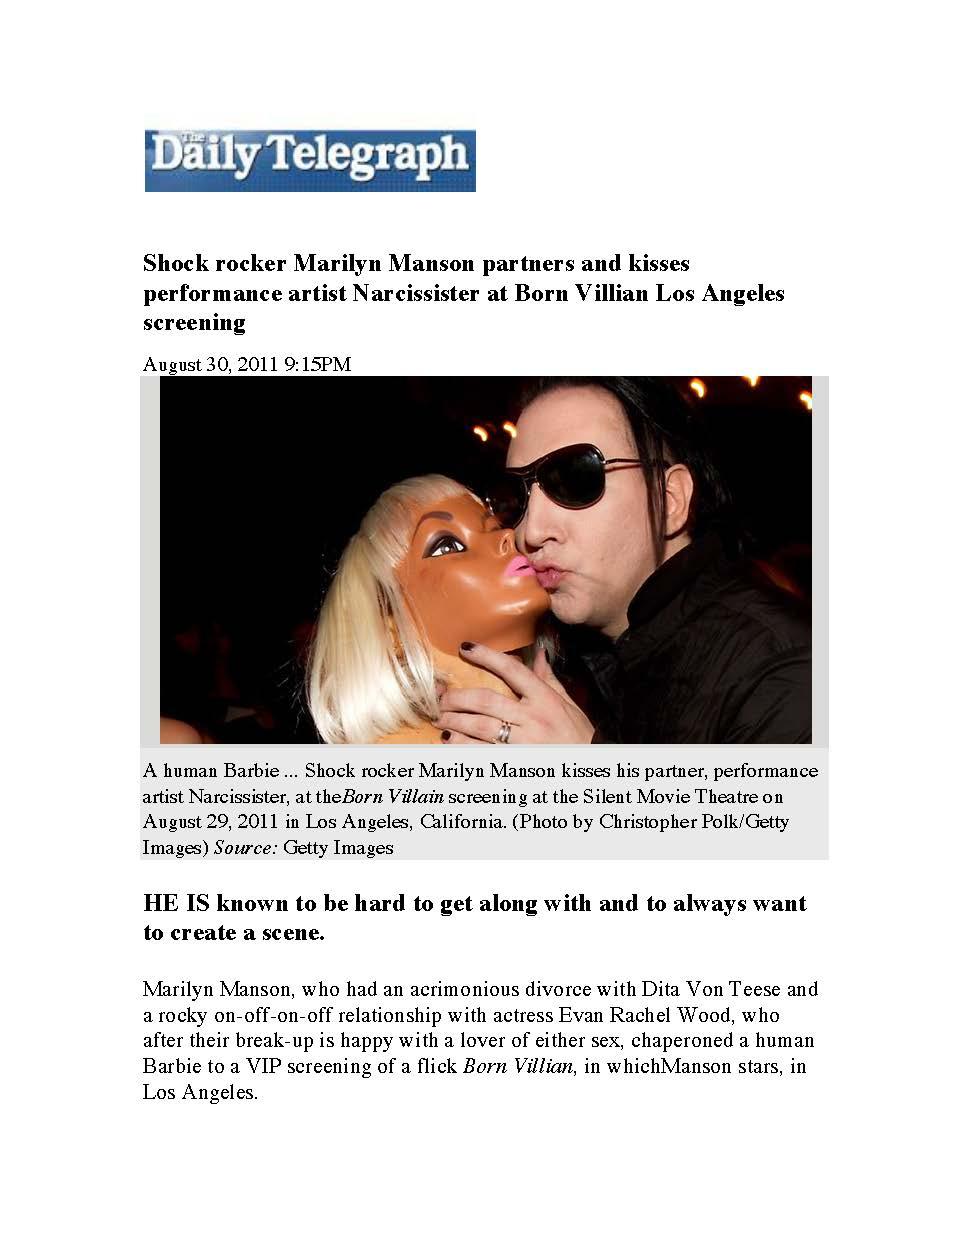 2011_DailyTelegraph_Page_1.jpg